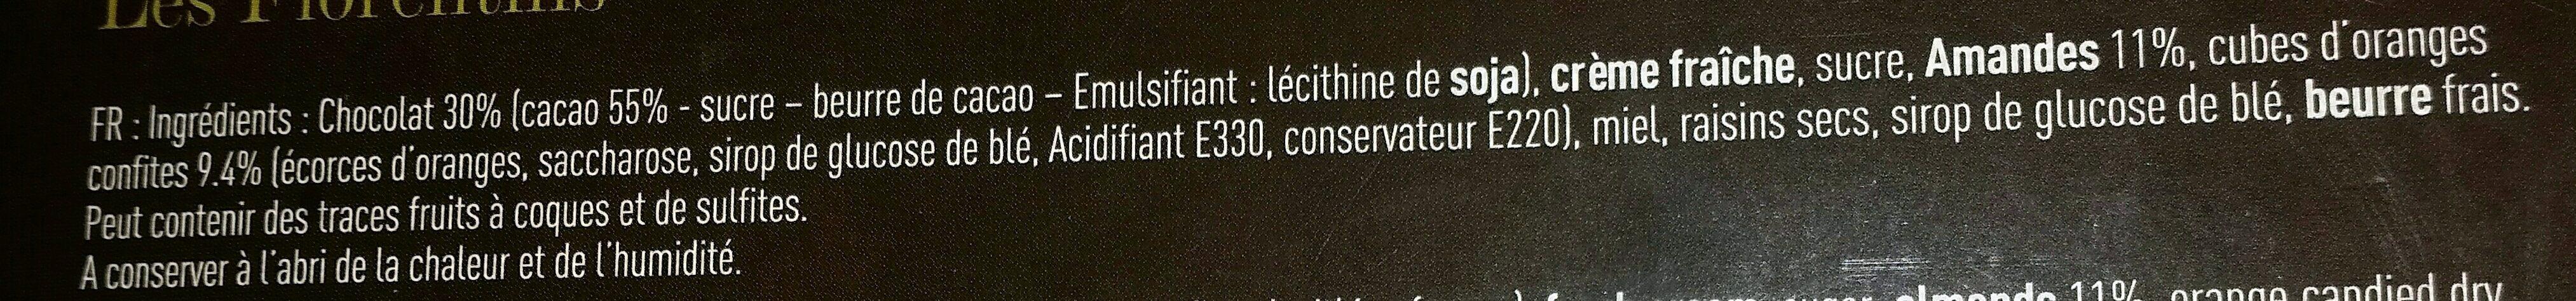 Les Florentins - Ingredients - fr